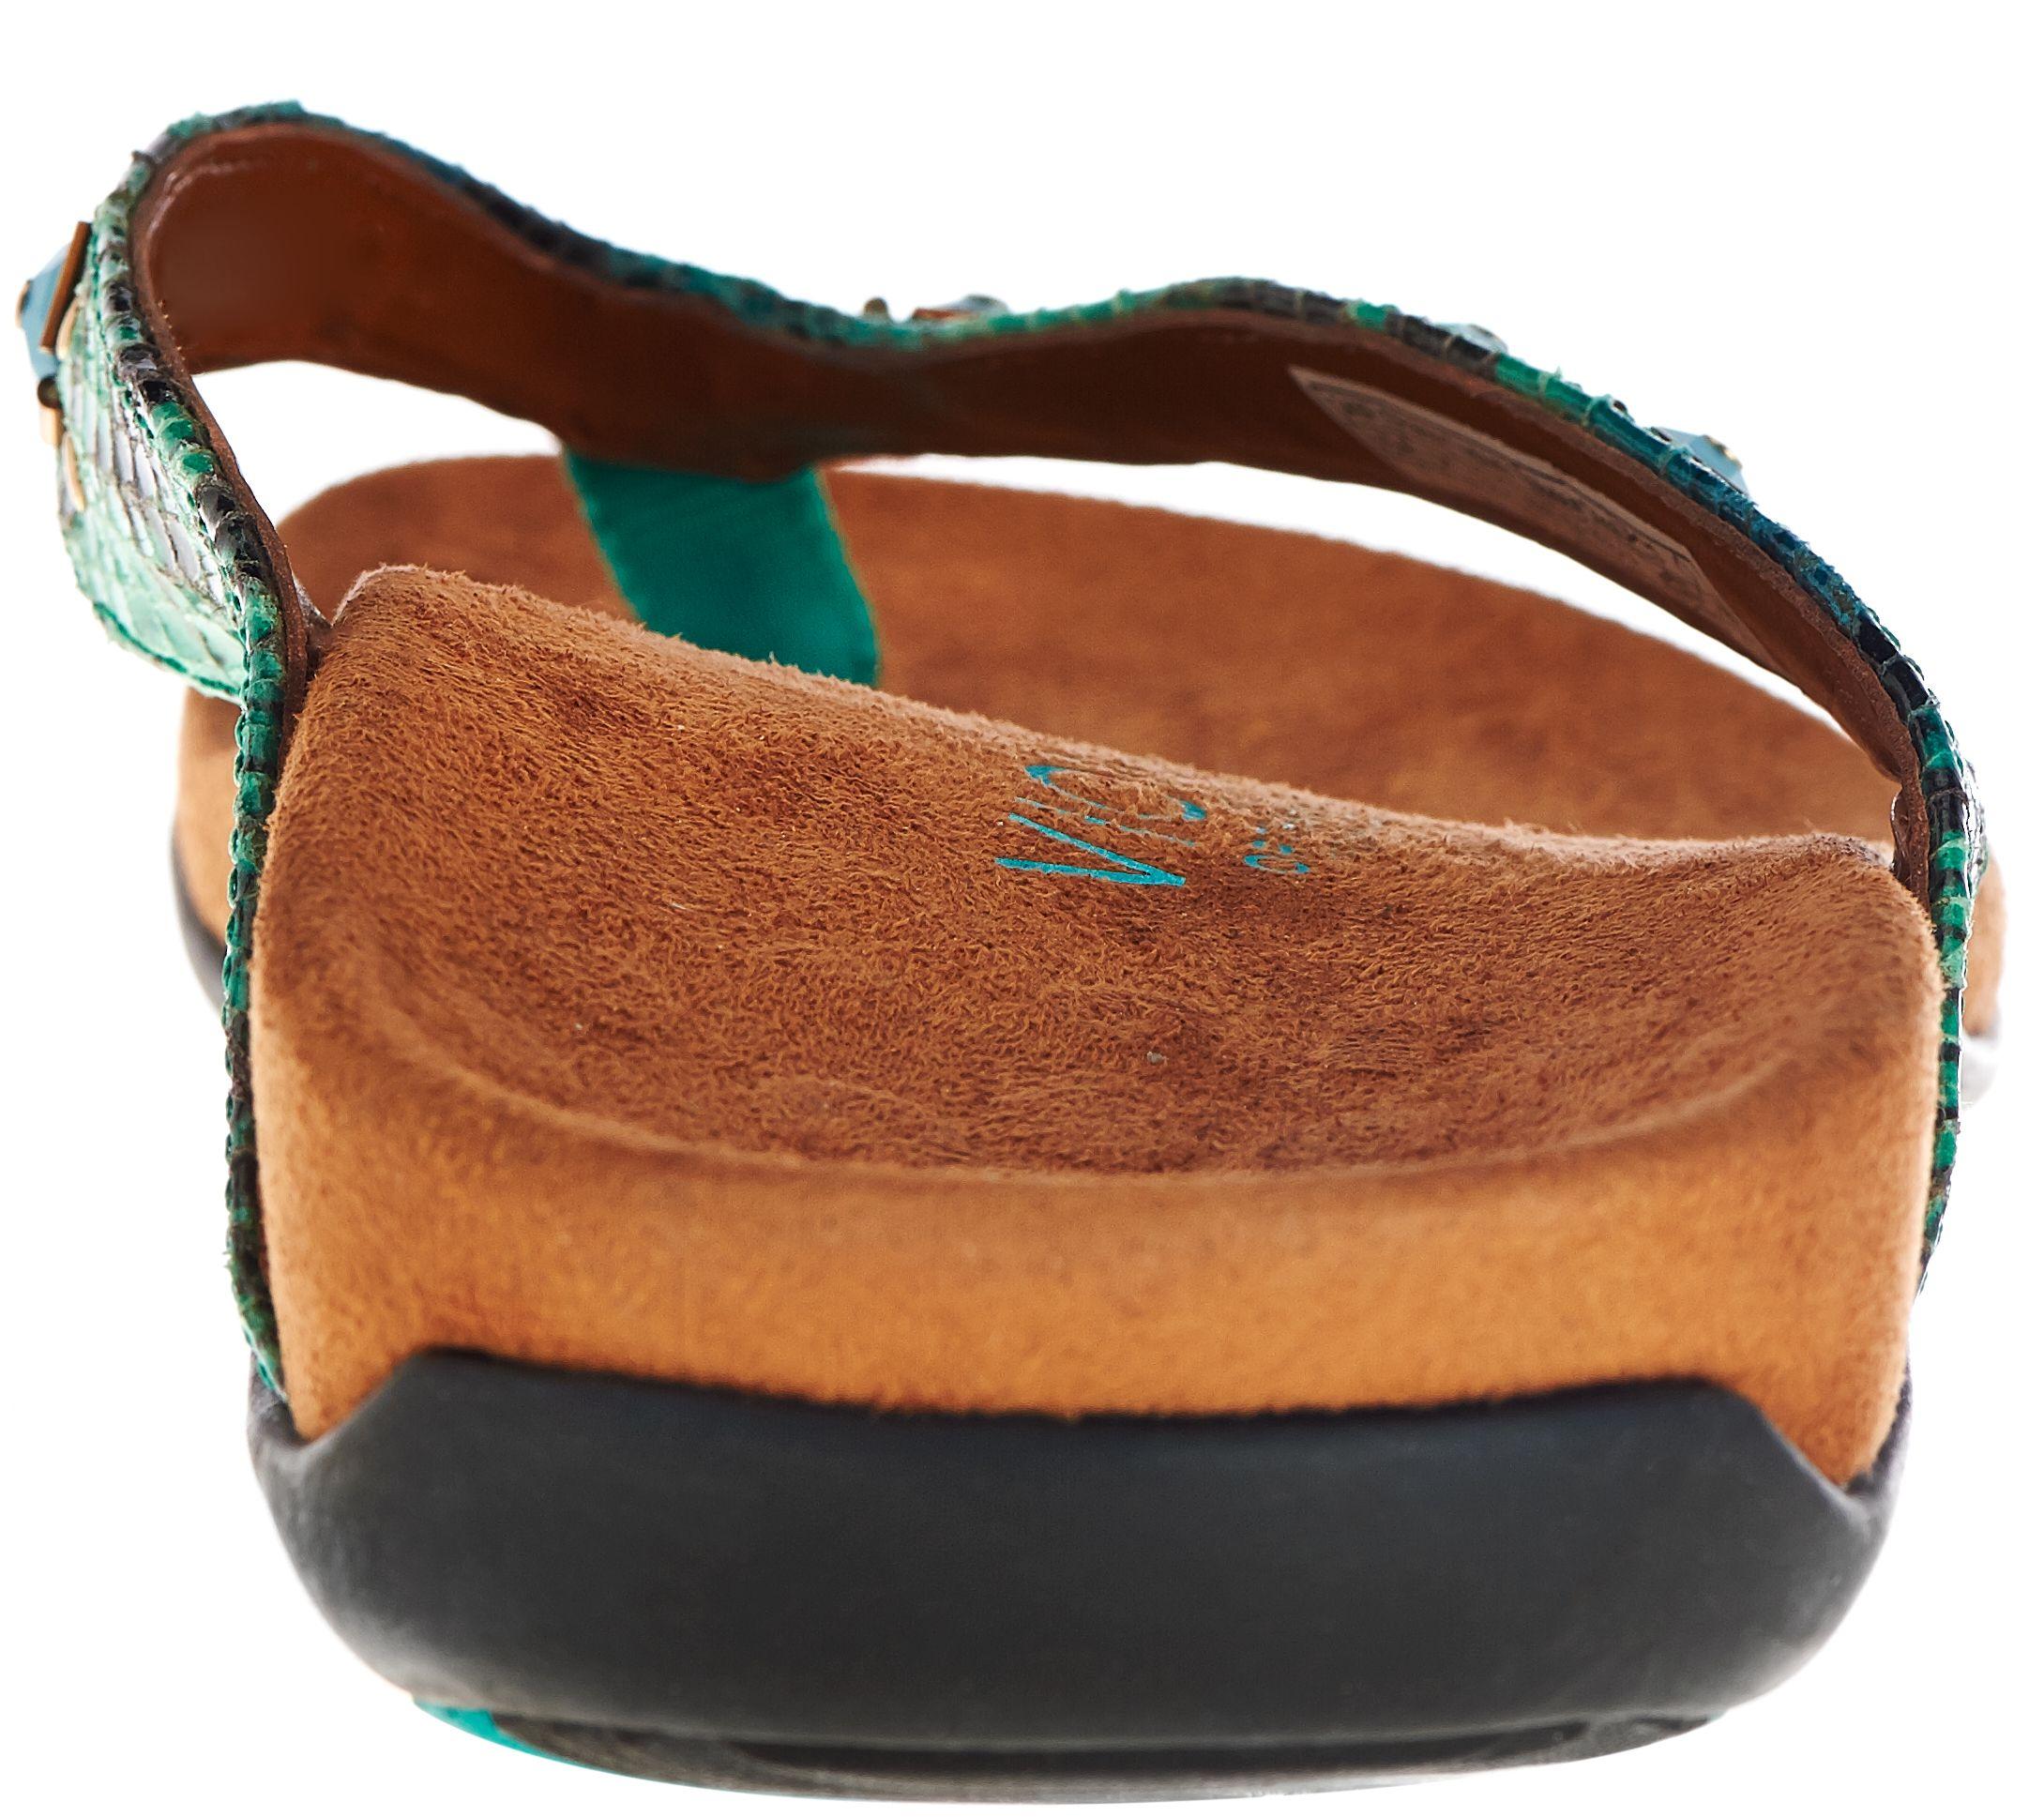 ecf431cb620 Vionic w  Orthaheel Embellished Thong Sandals - Floriana - Page 1 — QVC.com